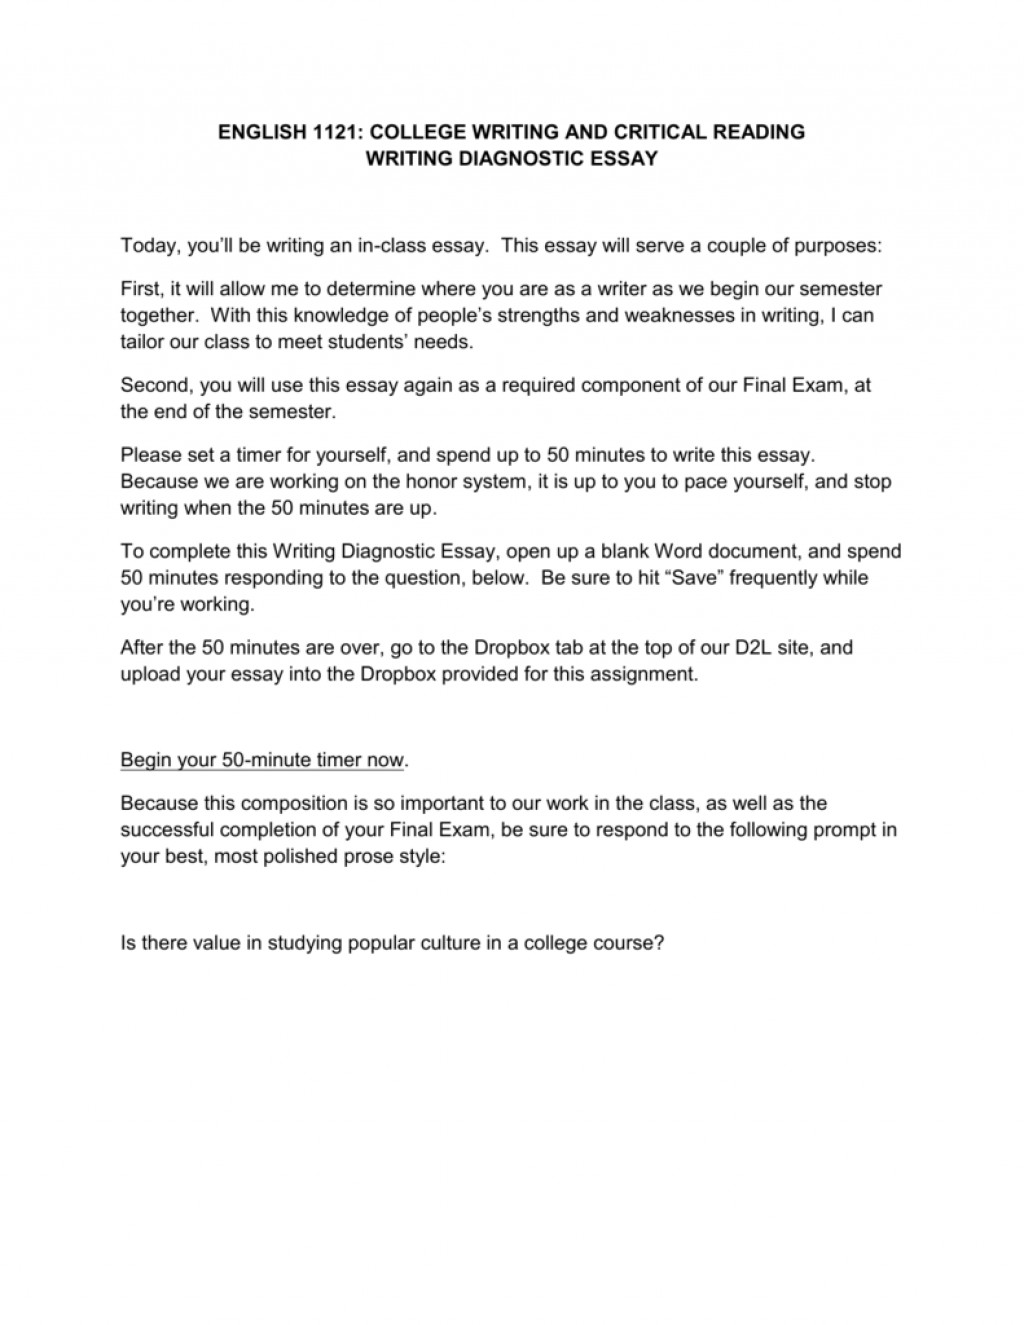 009 Diagnostic Essay 009173466 1 Wondrous Introduction Writing Prompts High School Large